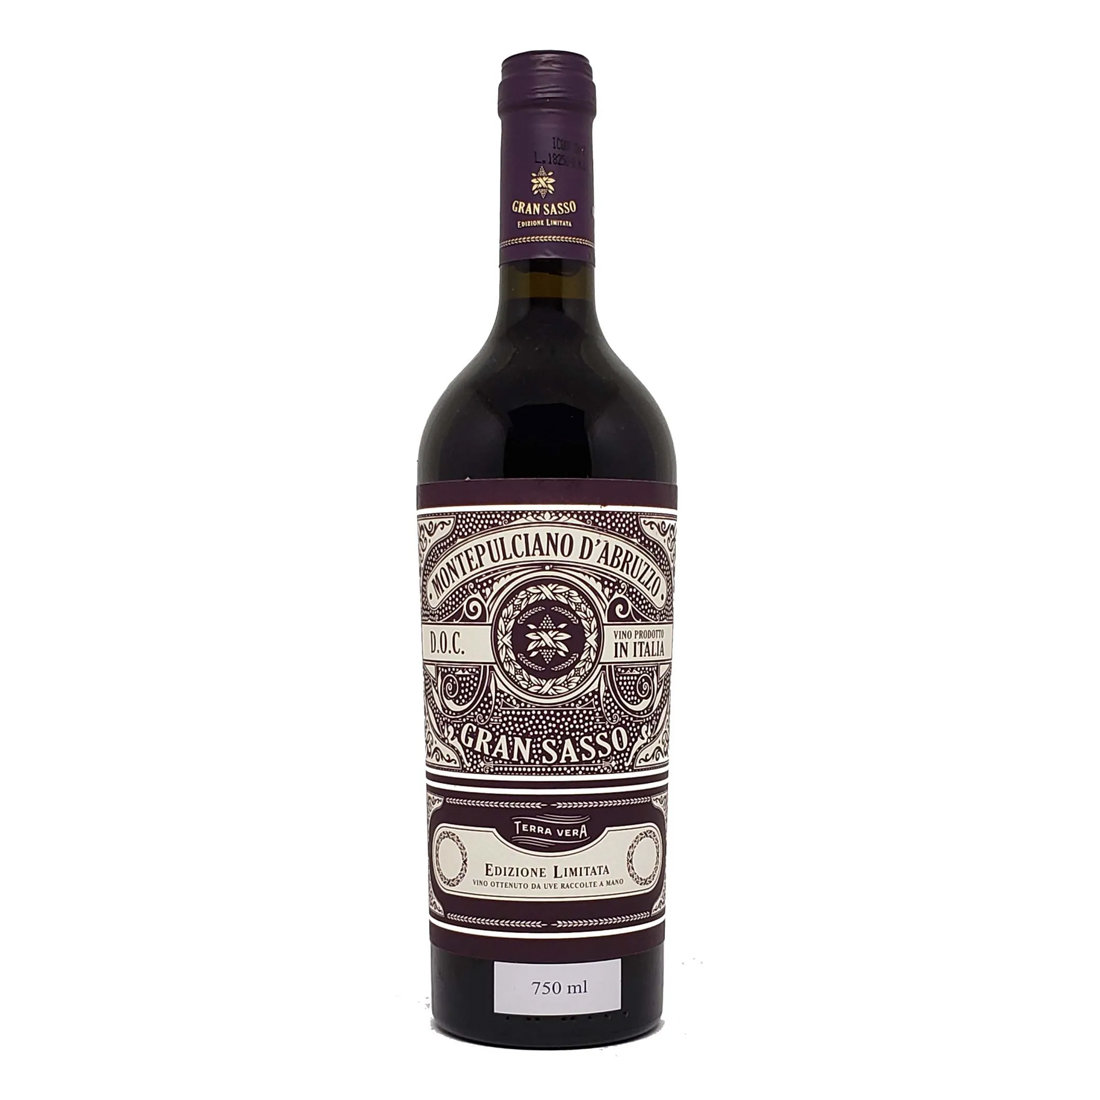 Vinho Gran Sasso Montepulciano D'abruzzo DOC 750 ml